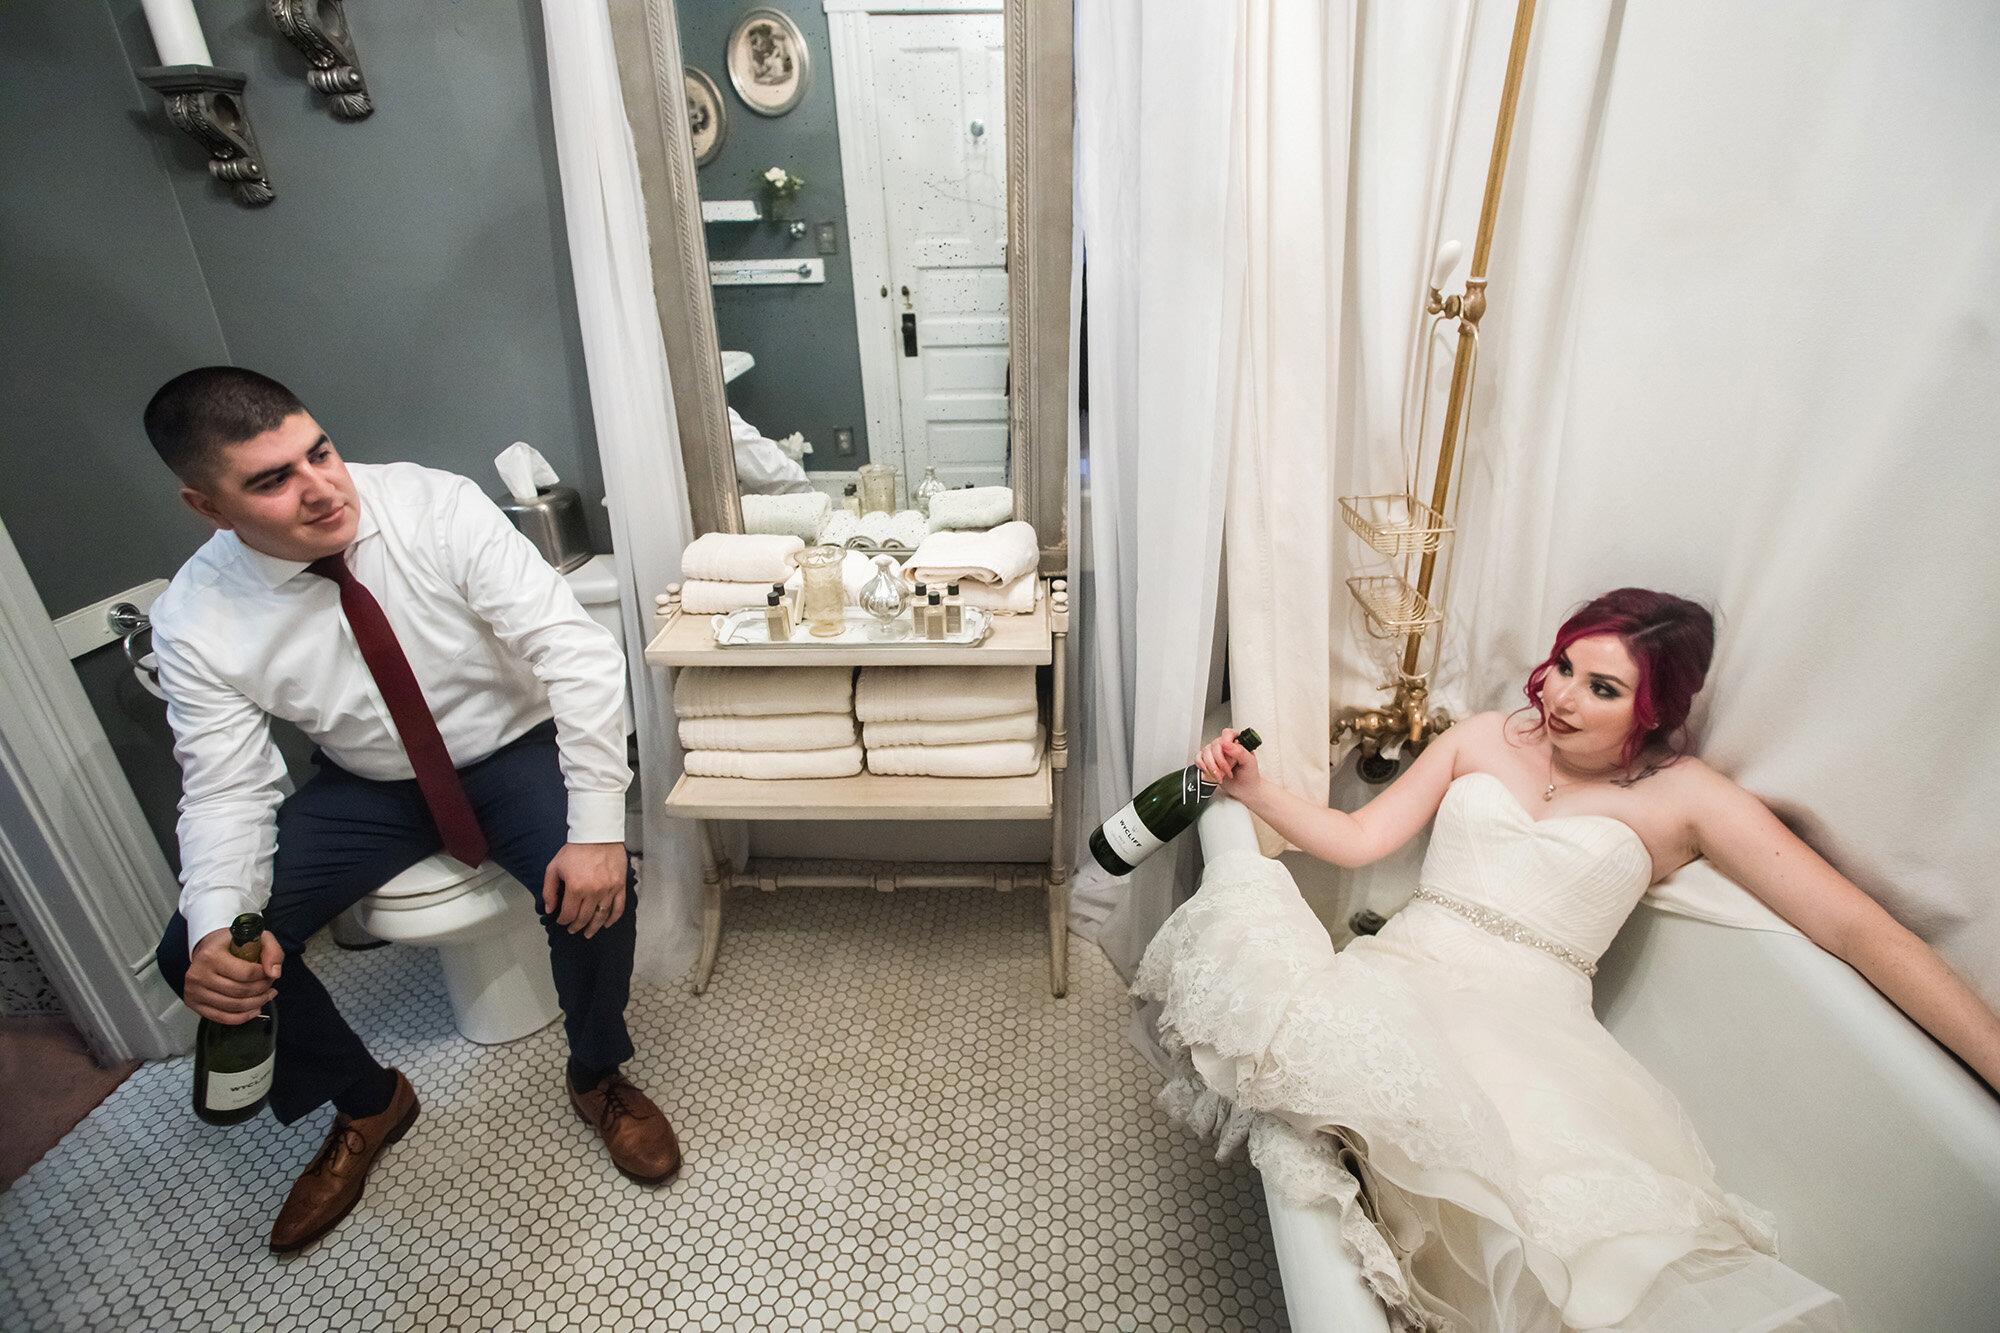 crazy-funchristmas-house-wedding-carrie-vines-016.jpg